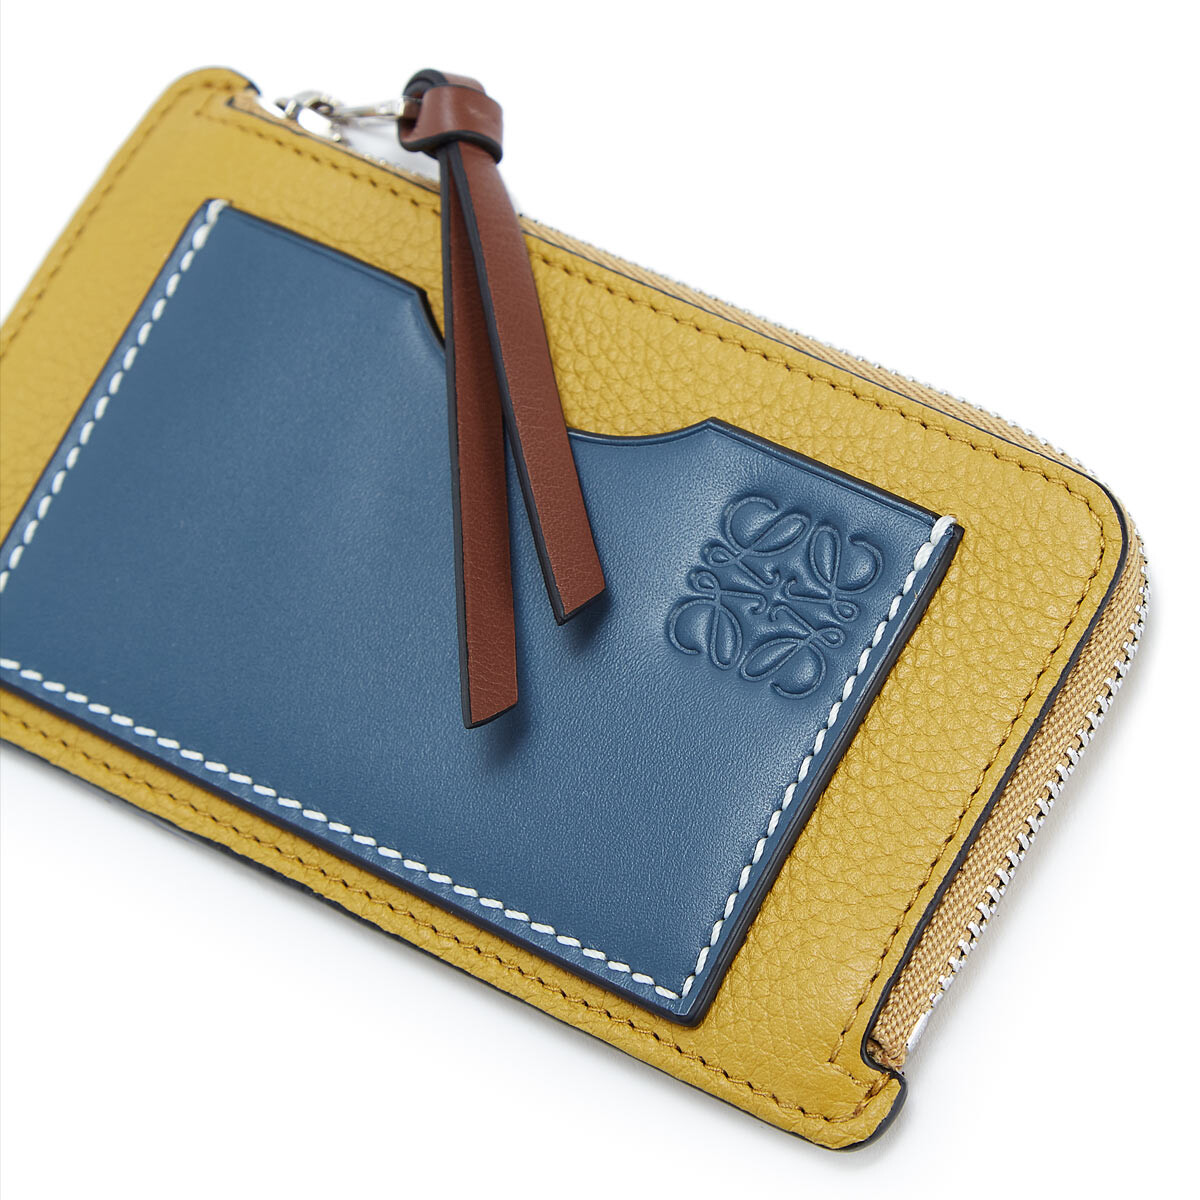 LOEWE Coin Cardholder Large Ochre/Steel Blue  front